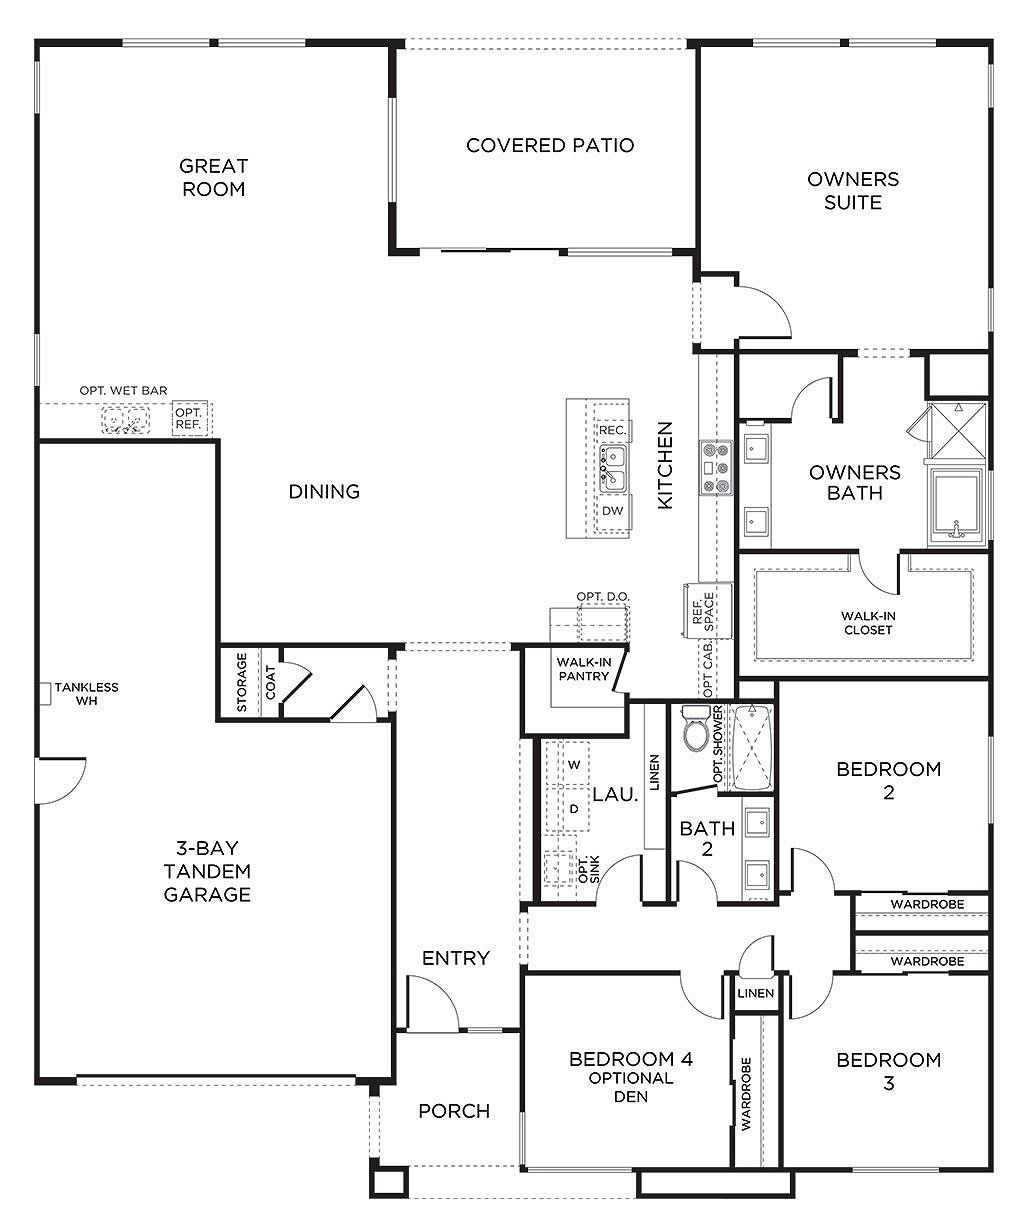 Plan 1 Pardee Homes Garage House Plans House Floor Plans Tandem Garage